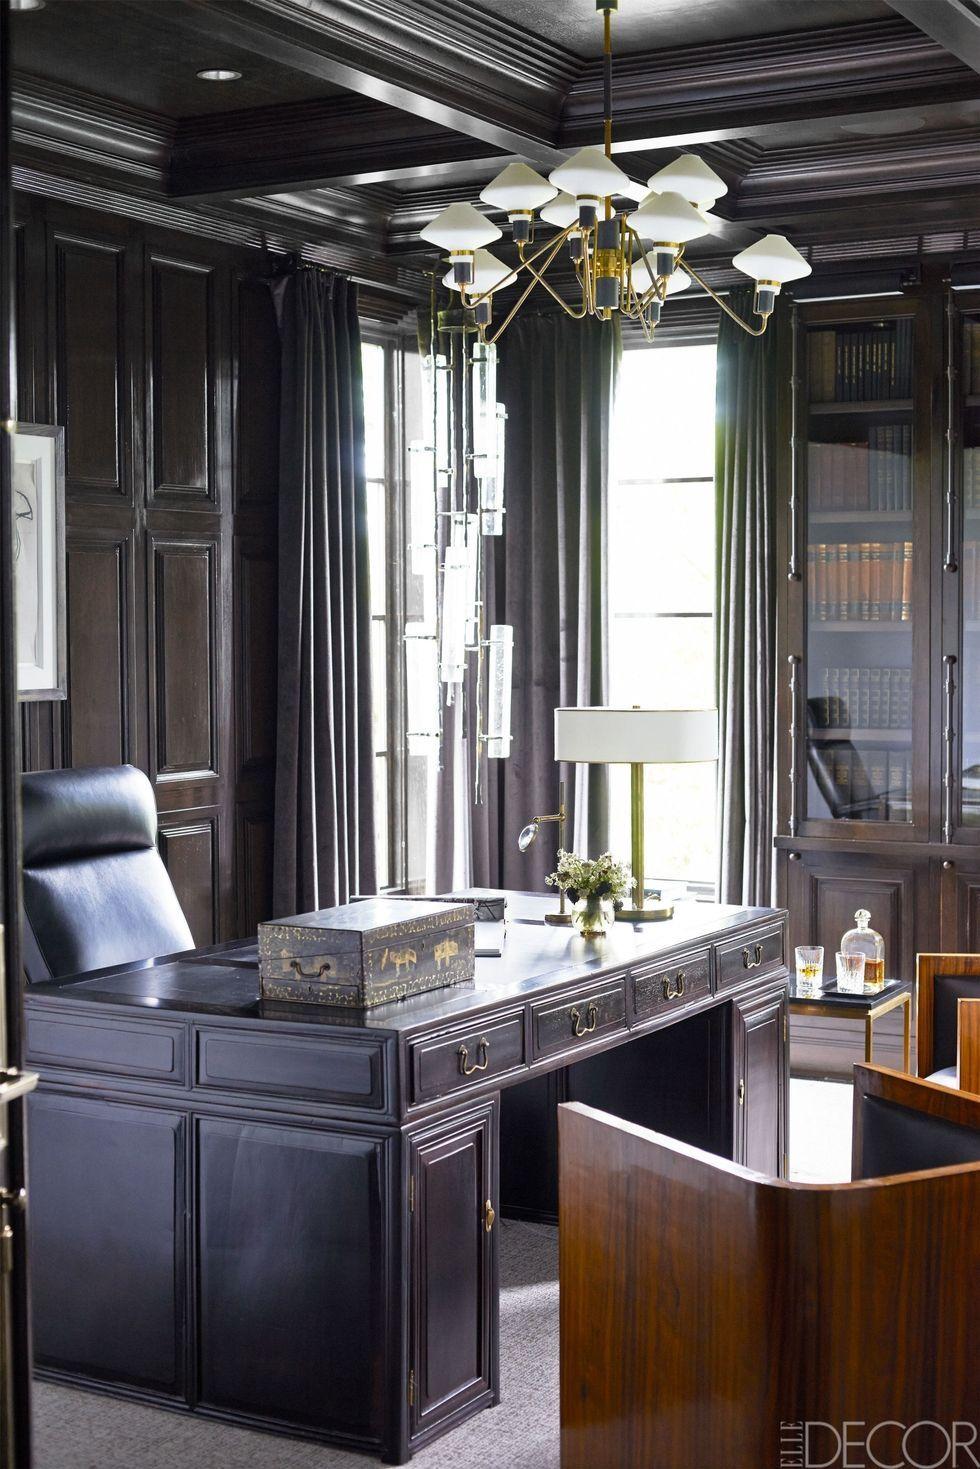 Home office design ideas Small Spaces Homeofficeideas Elle Decor Stylish Home Office Ideas Chic Home Study